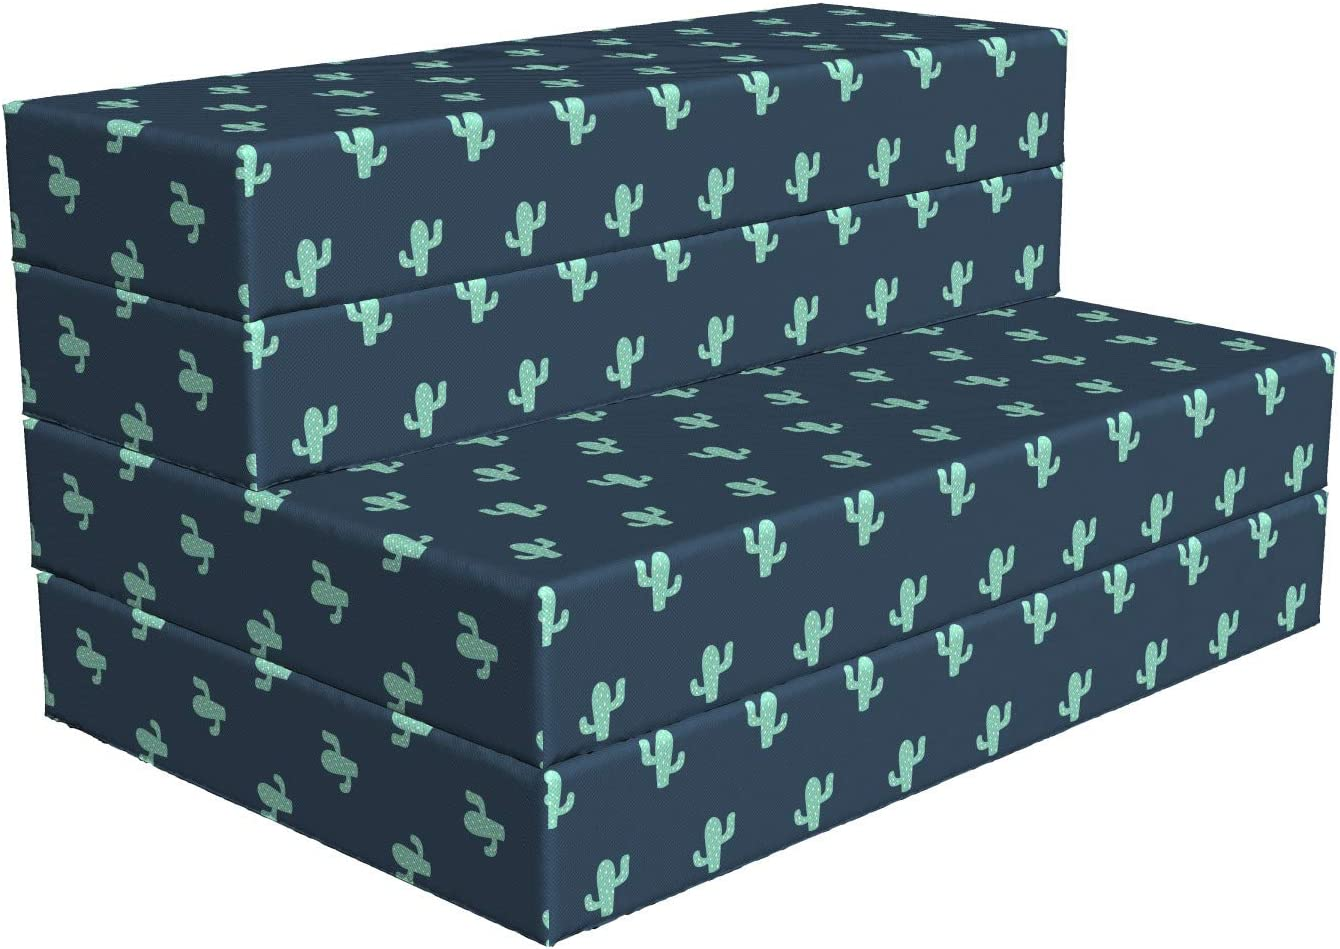 Seattle Mall Lunarable Cactus Foldable Mattress Concept 7 Max 42% OFF Plantation Desert